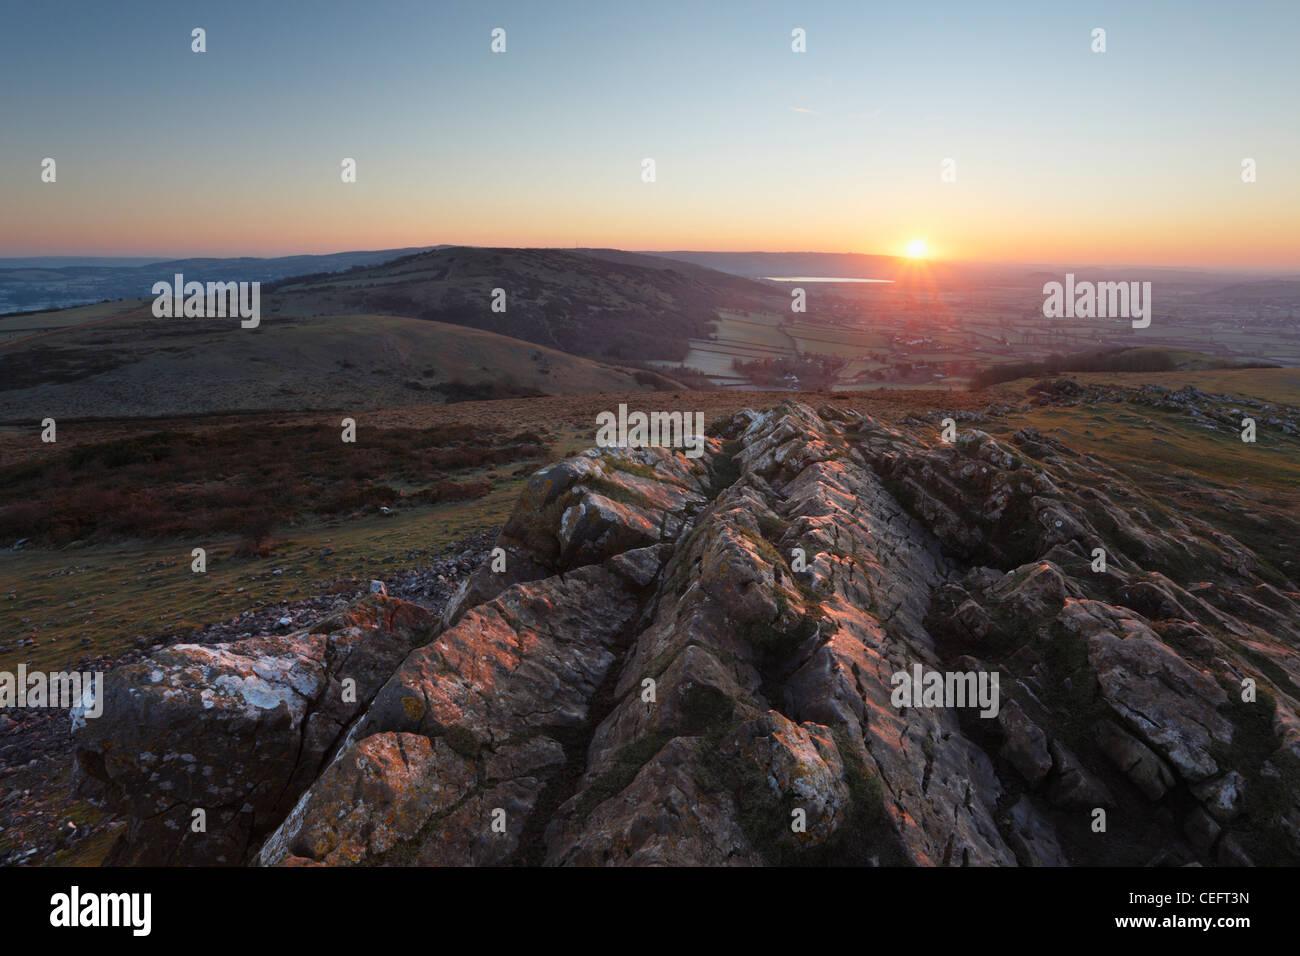 Sunrise over the Mendip Hills from Crook Peak. Somerset. England. UK. - Stock Image